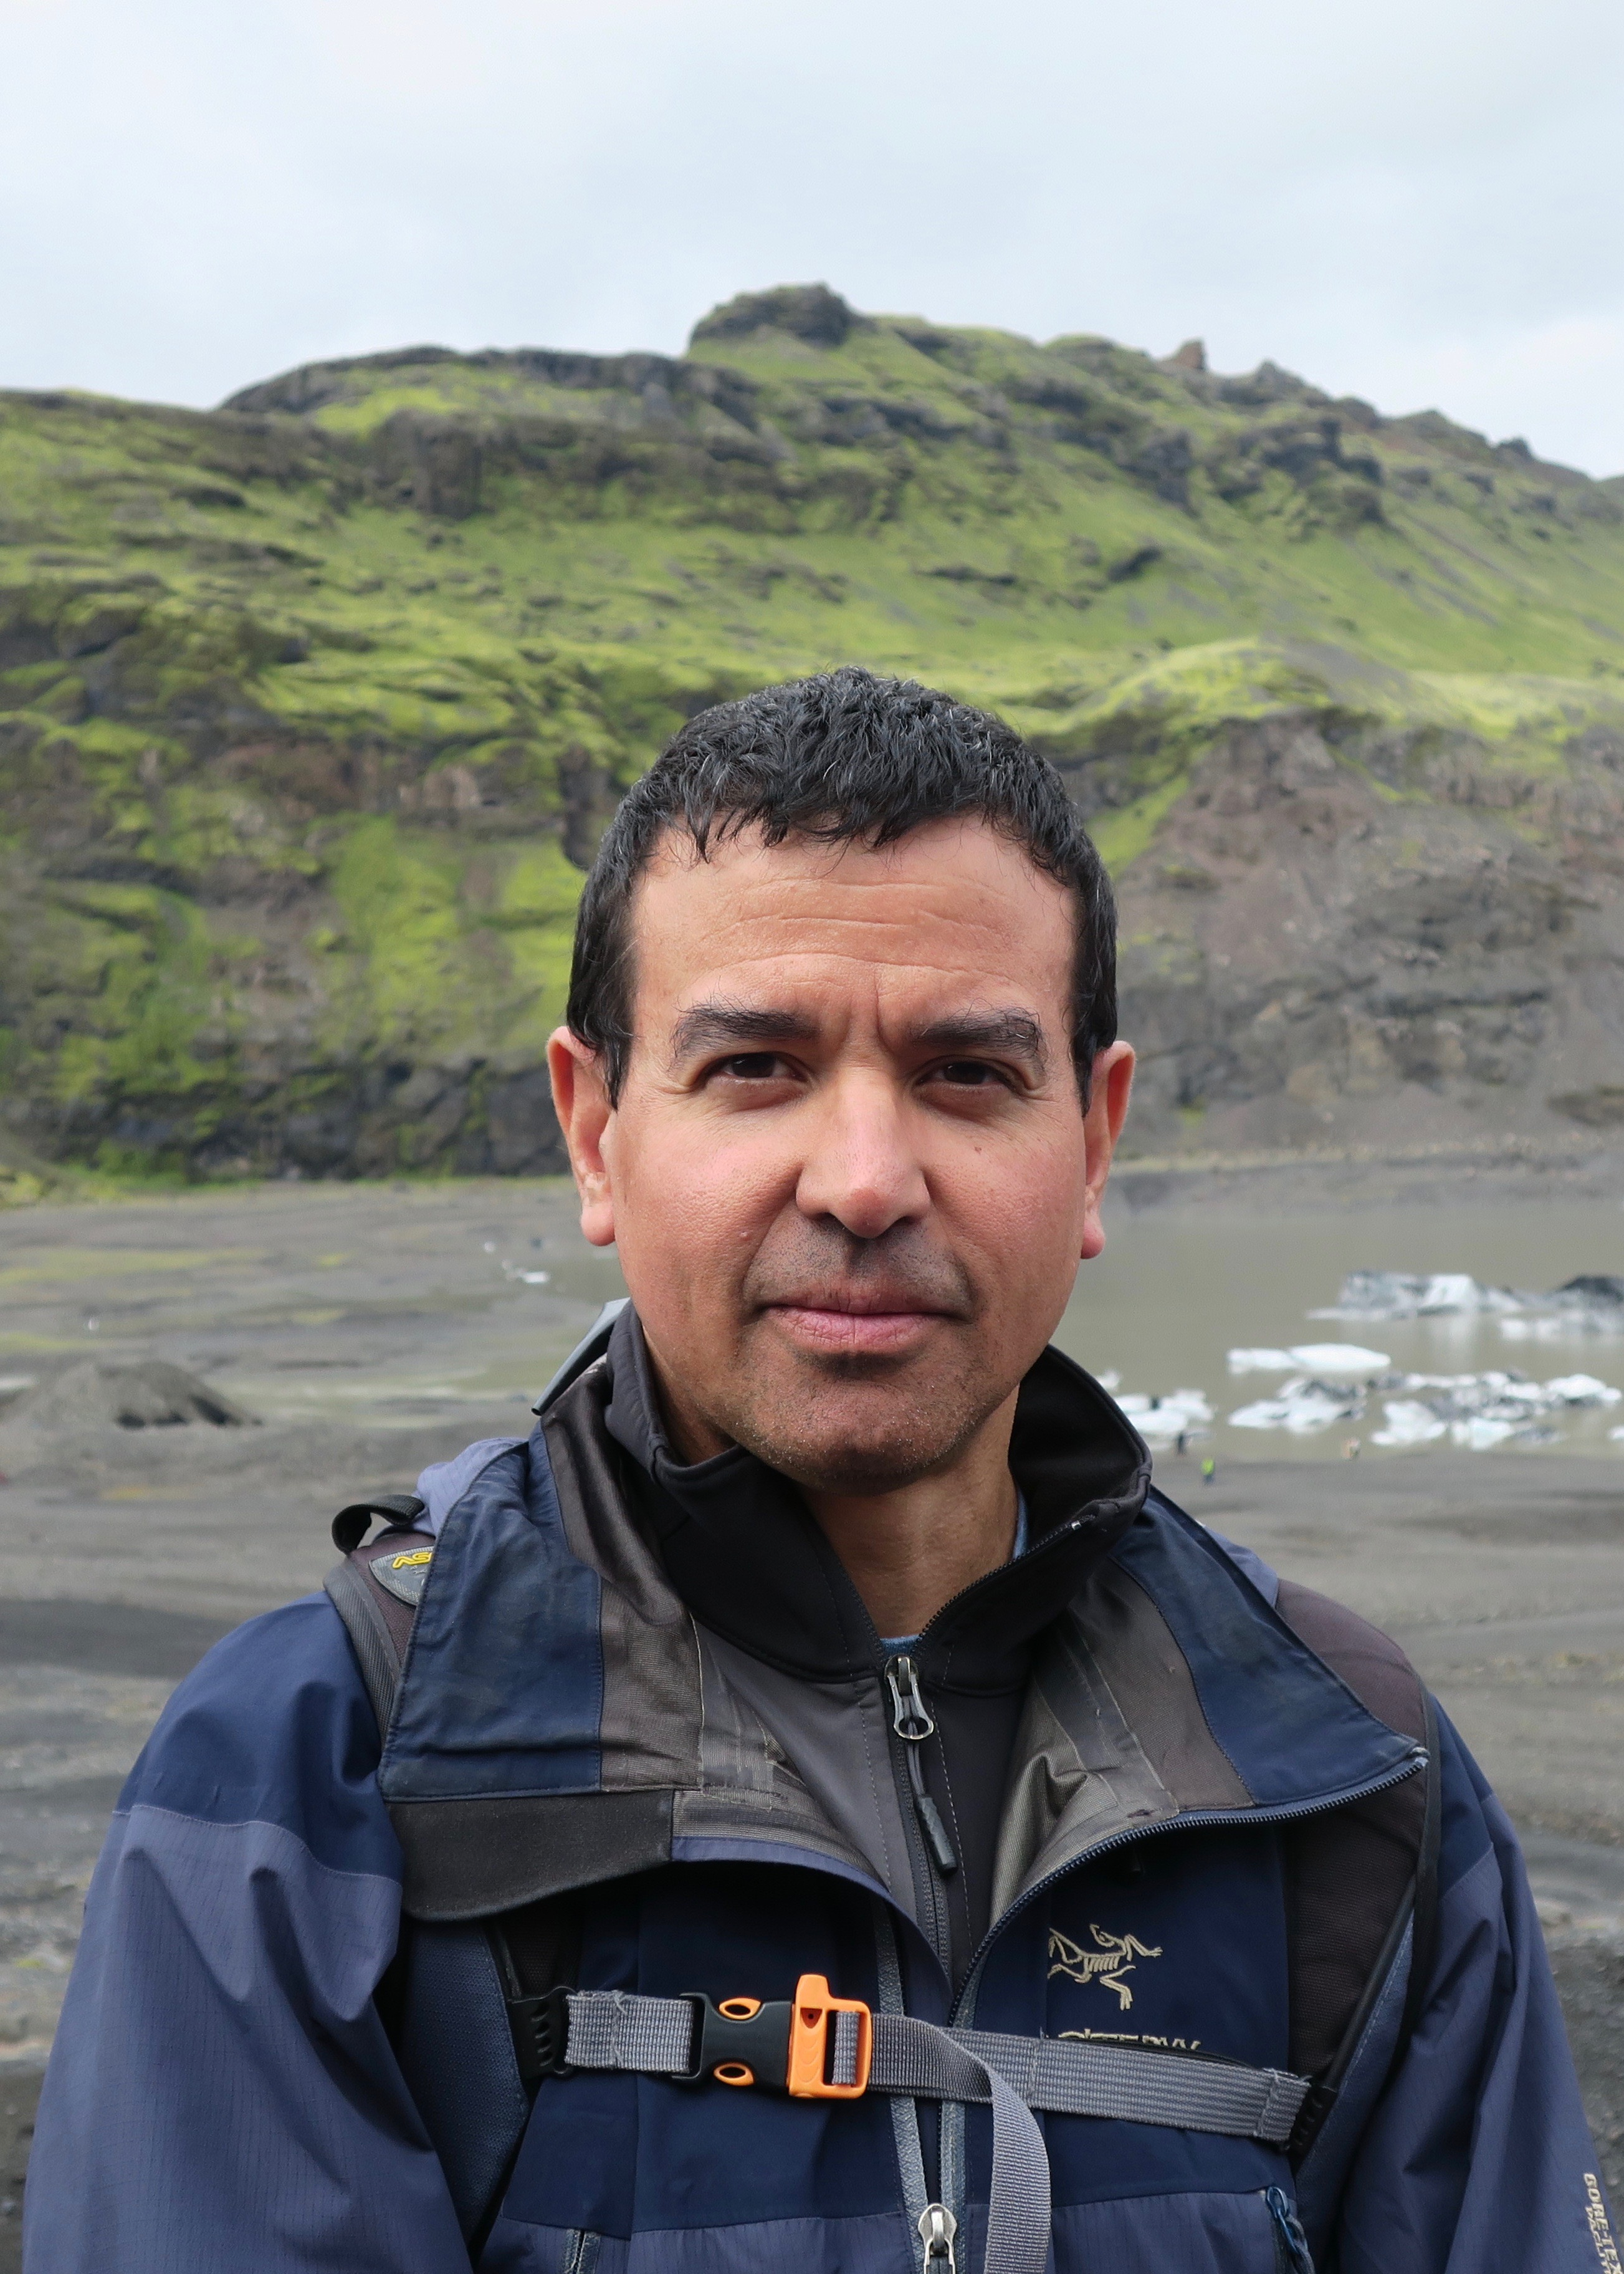 Pedro Jugo